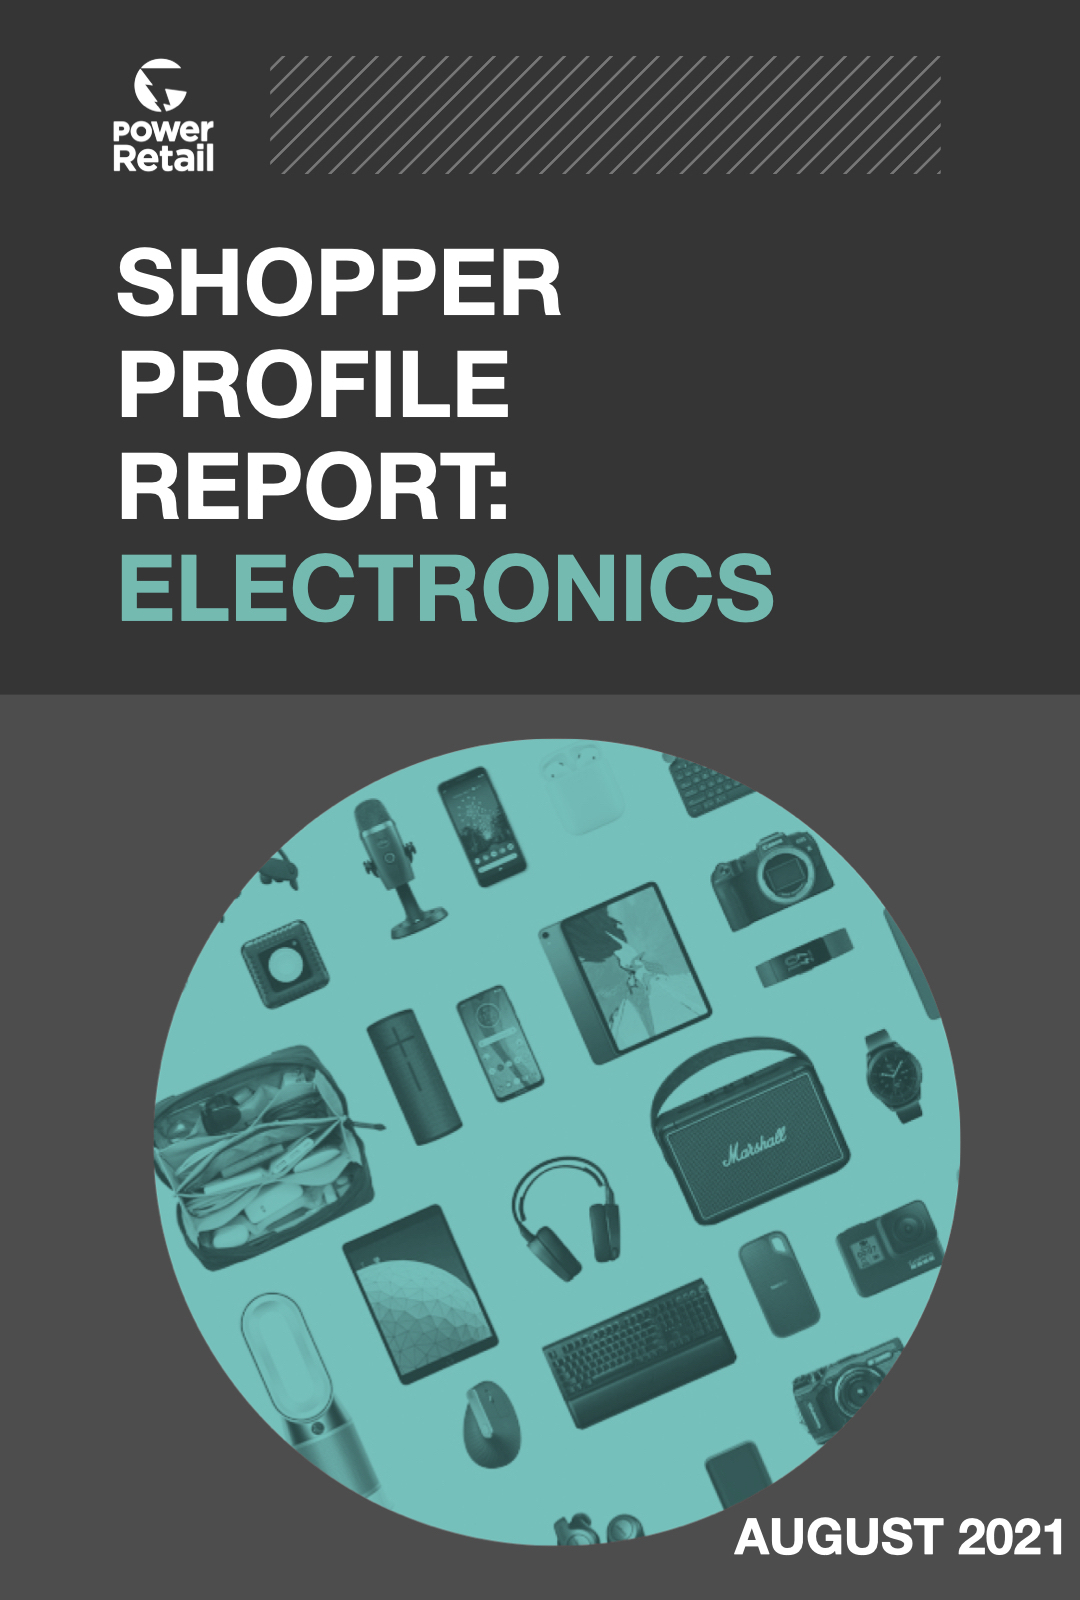 Shopper Profile Report: Electronics